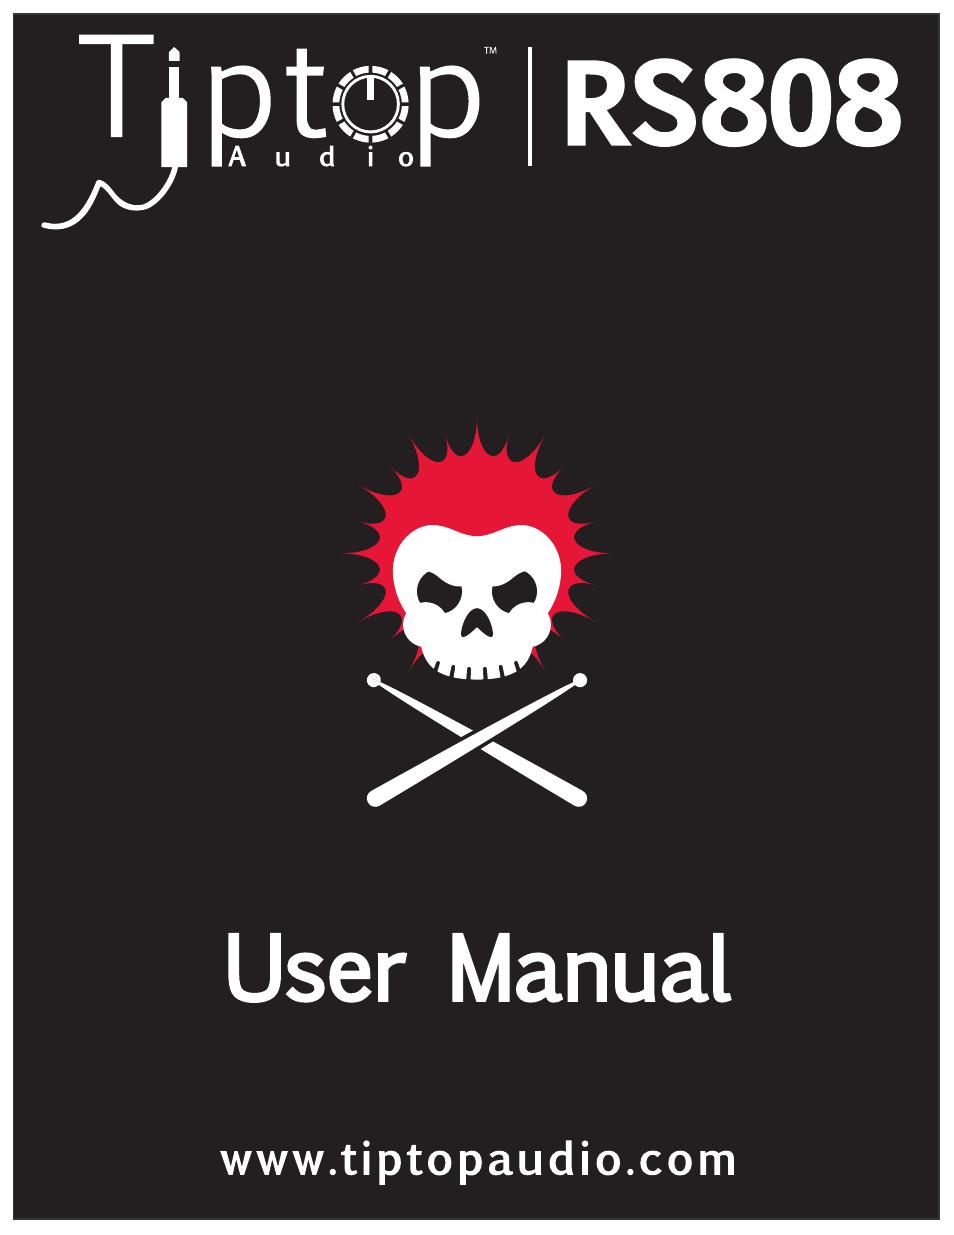 Tiptop RS808 Rimshot Claves User Manual